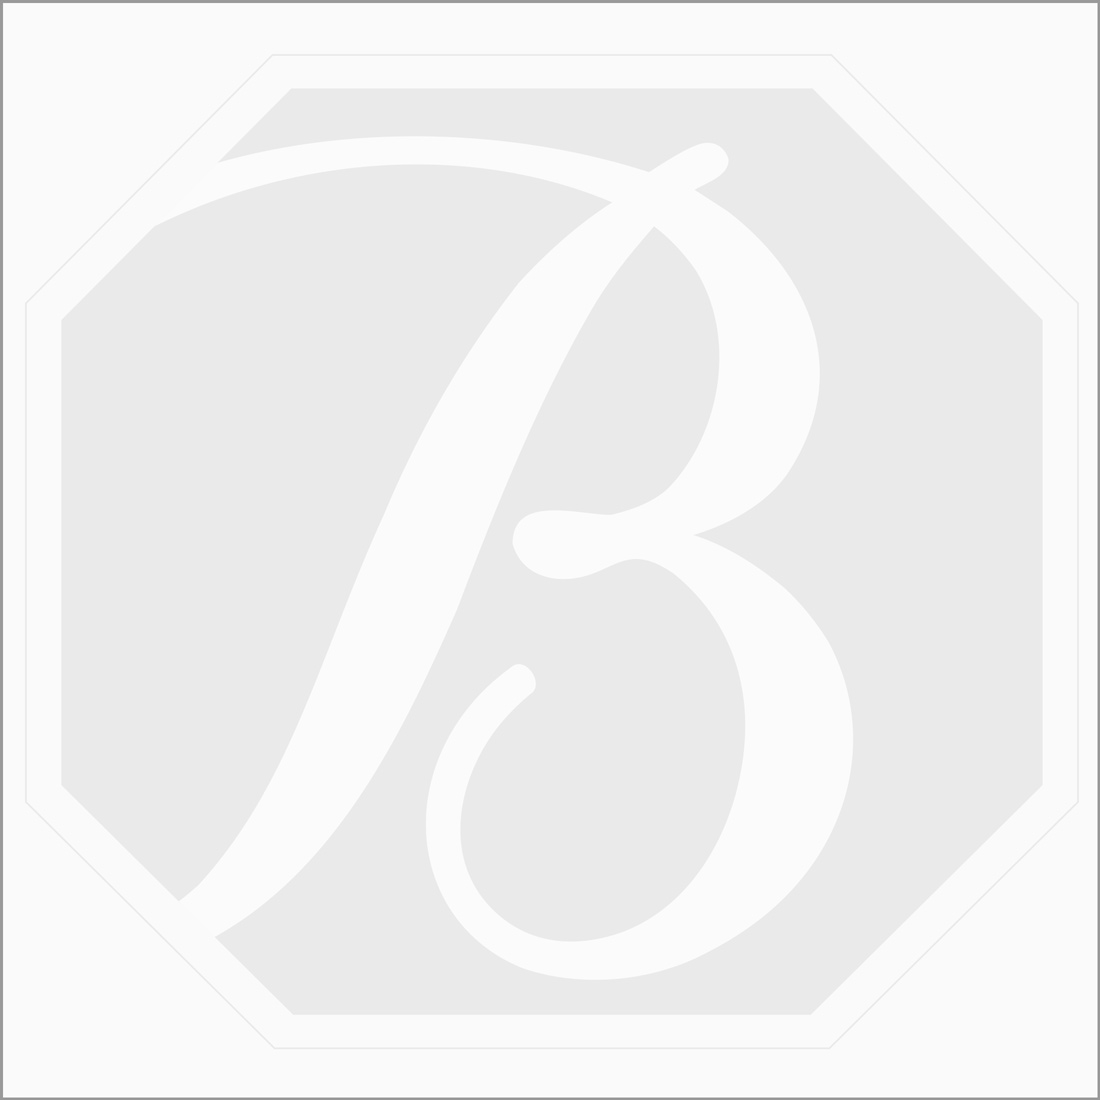 8 x 6.30 mm - Medium Tones Multi-Sapphire Oval Rose Cut Gemstones - 28 Pieces - 52.48 carats (MSRC1006)